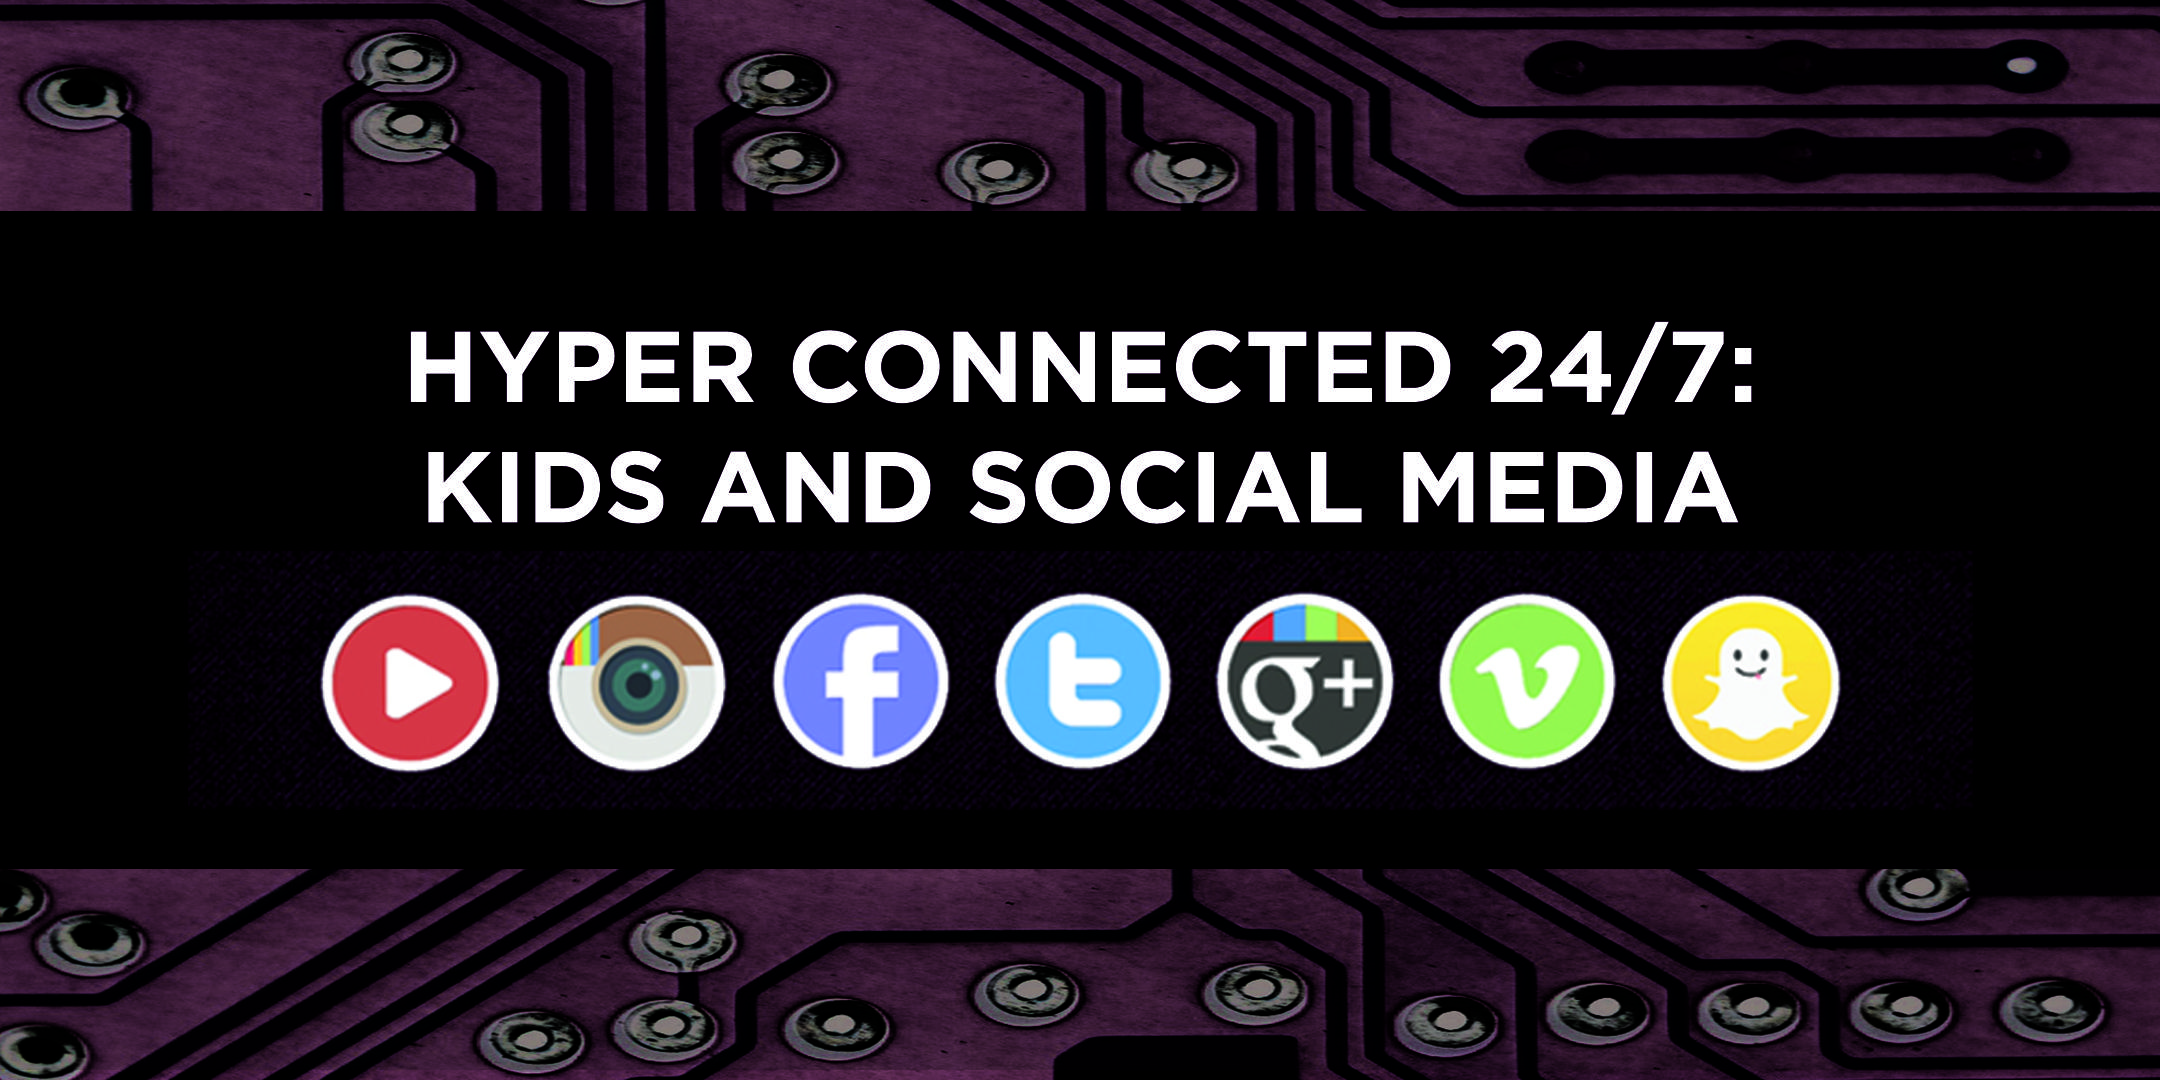 Hyper Connected 24/7: Kids & Social Media